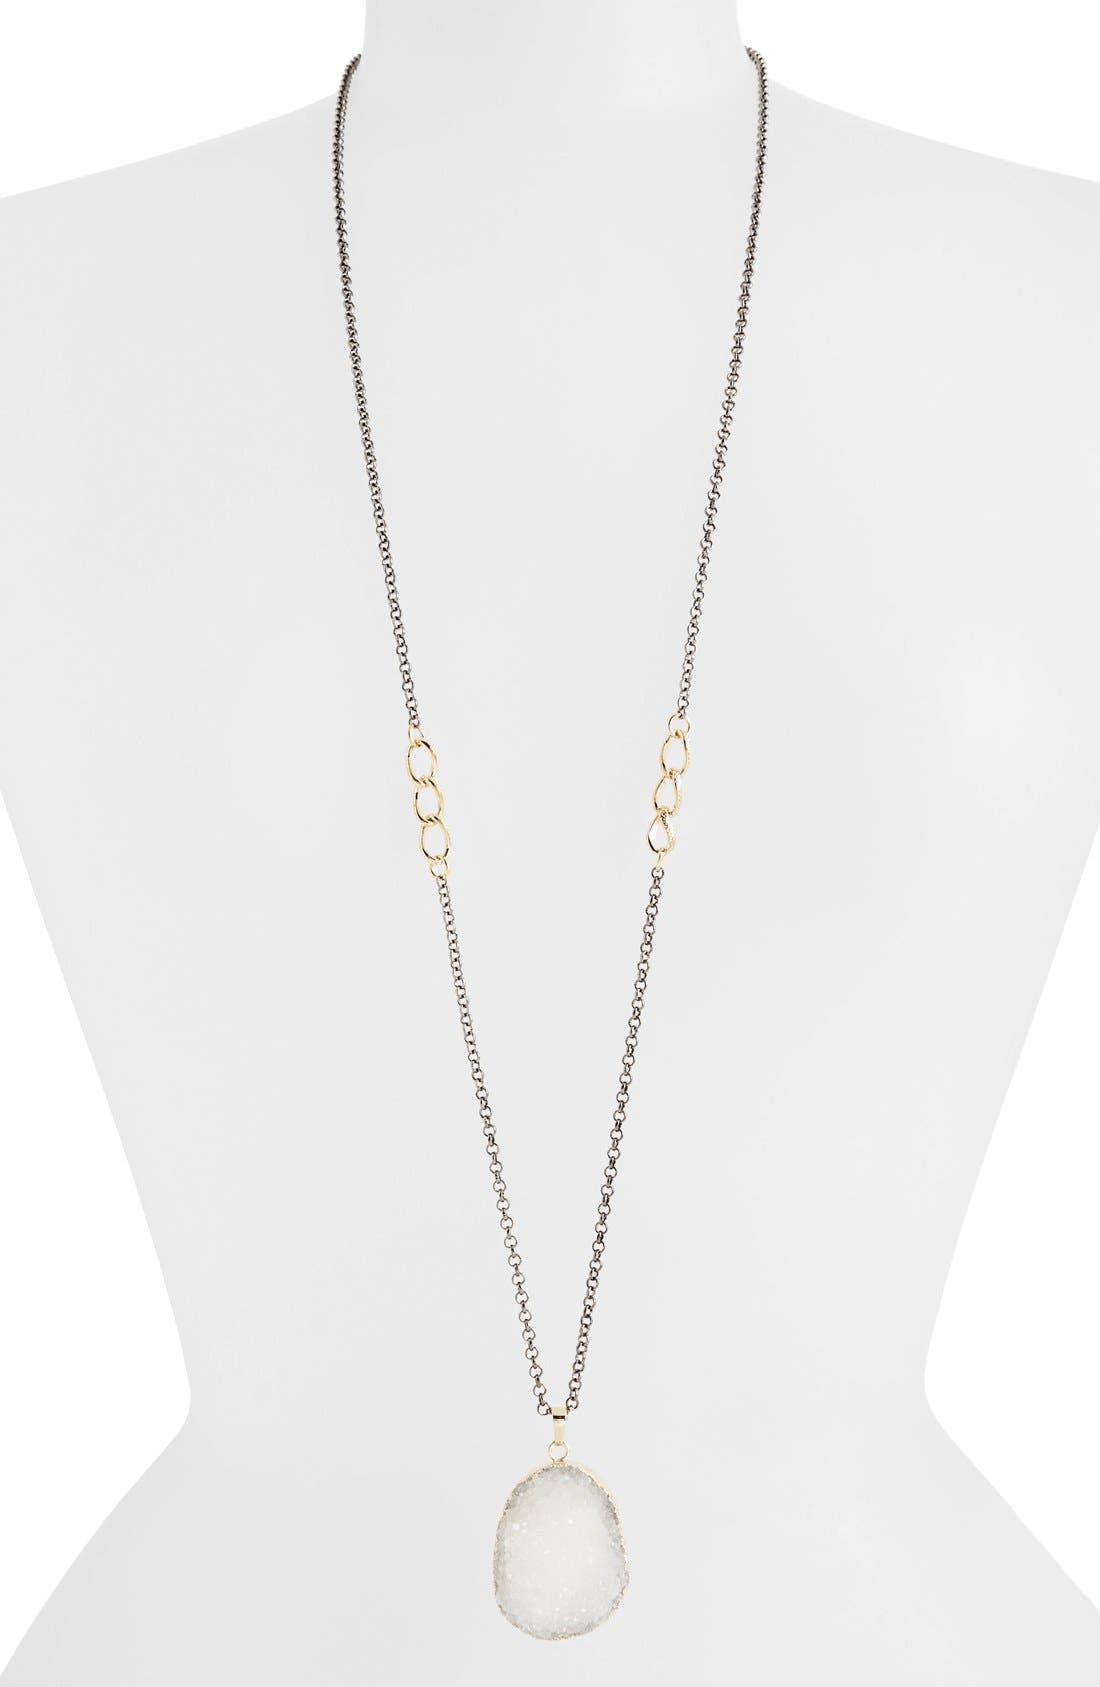 Main Image - Panacea Glittering Drusy Pendant Necklace